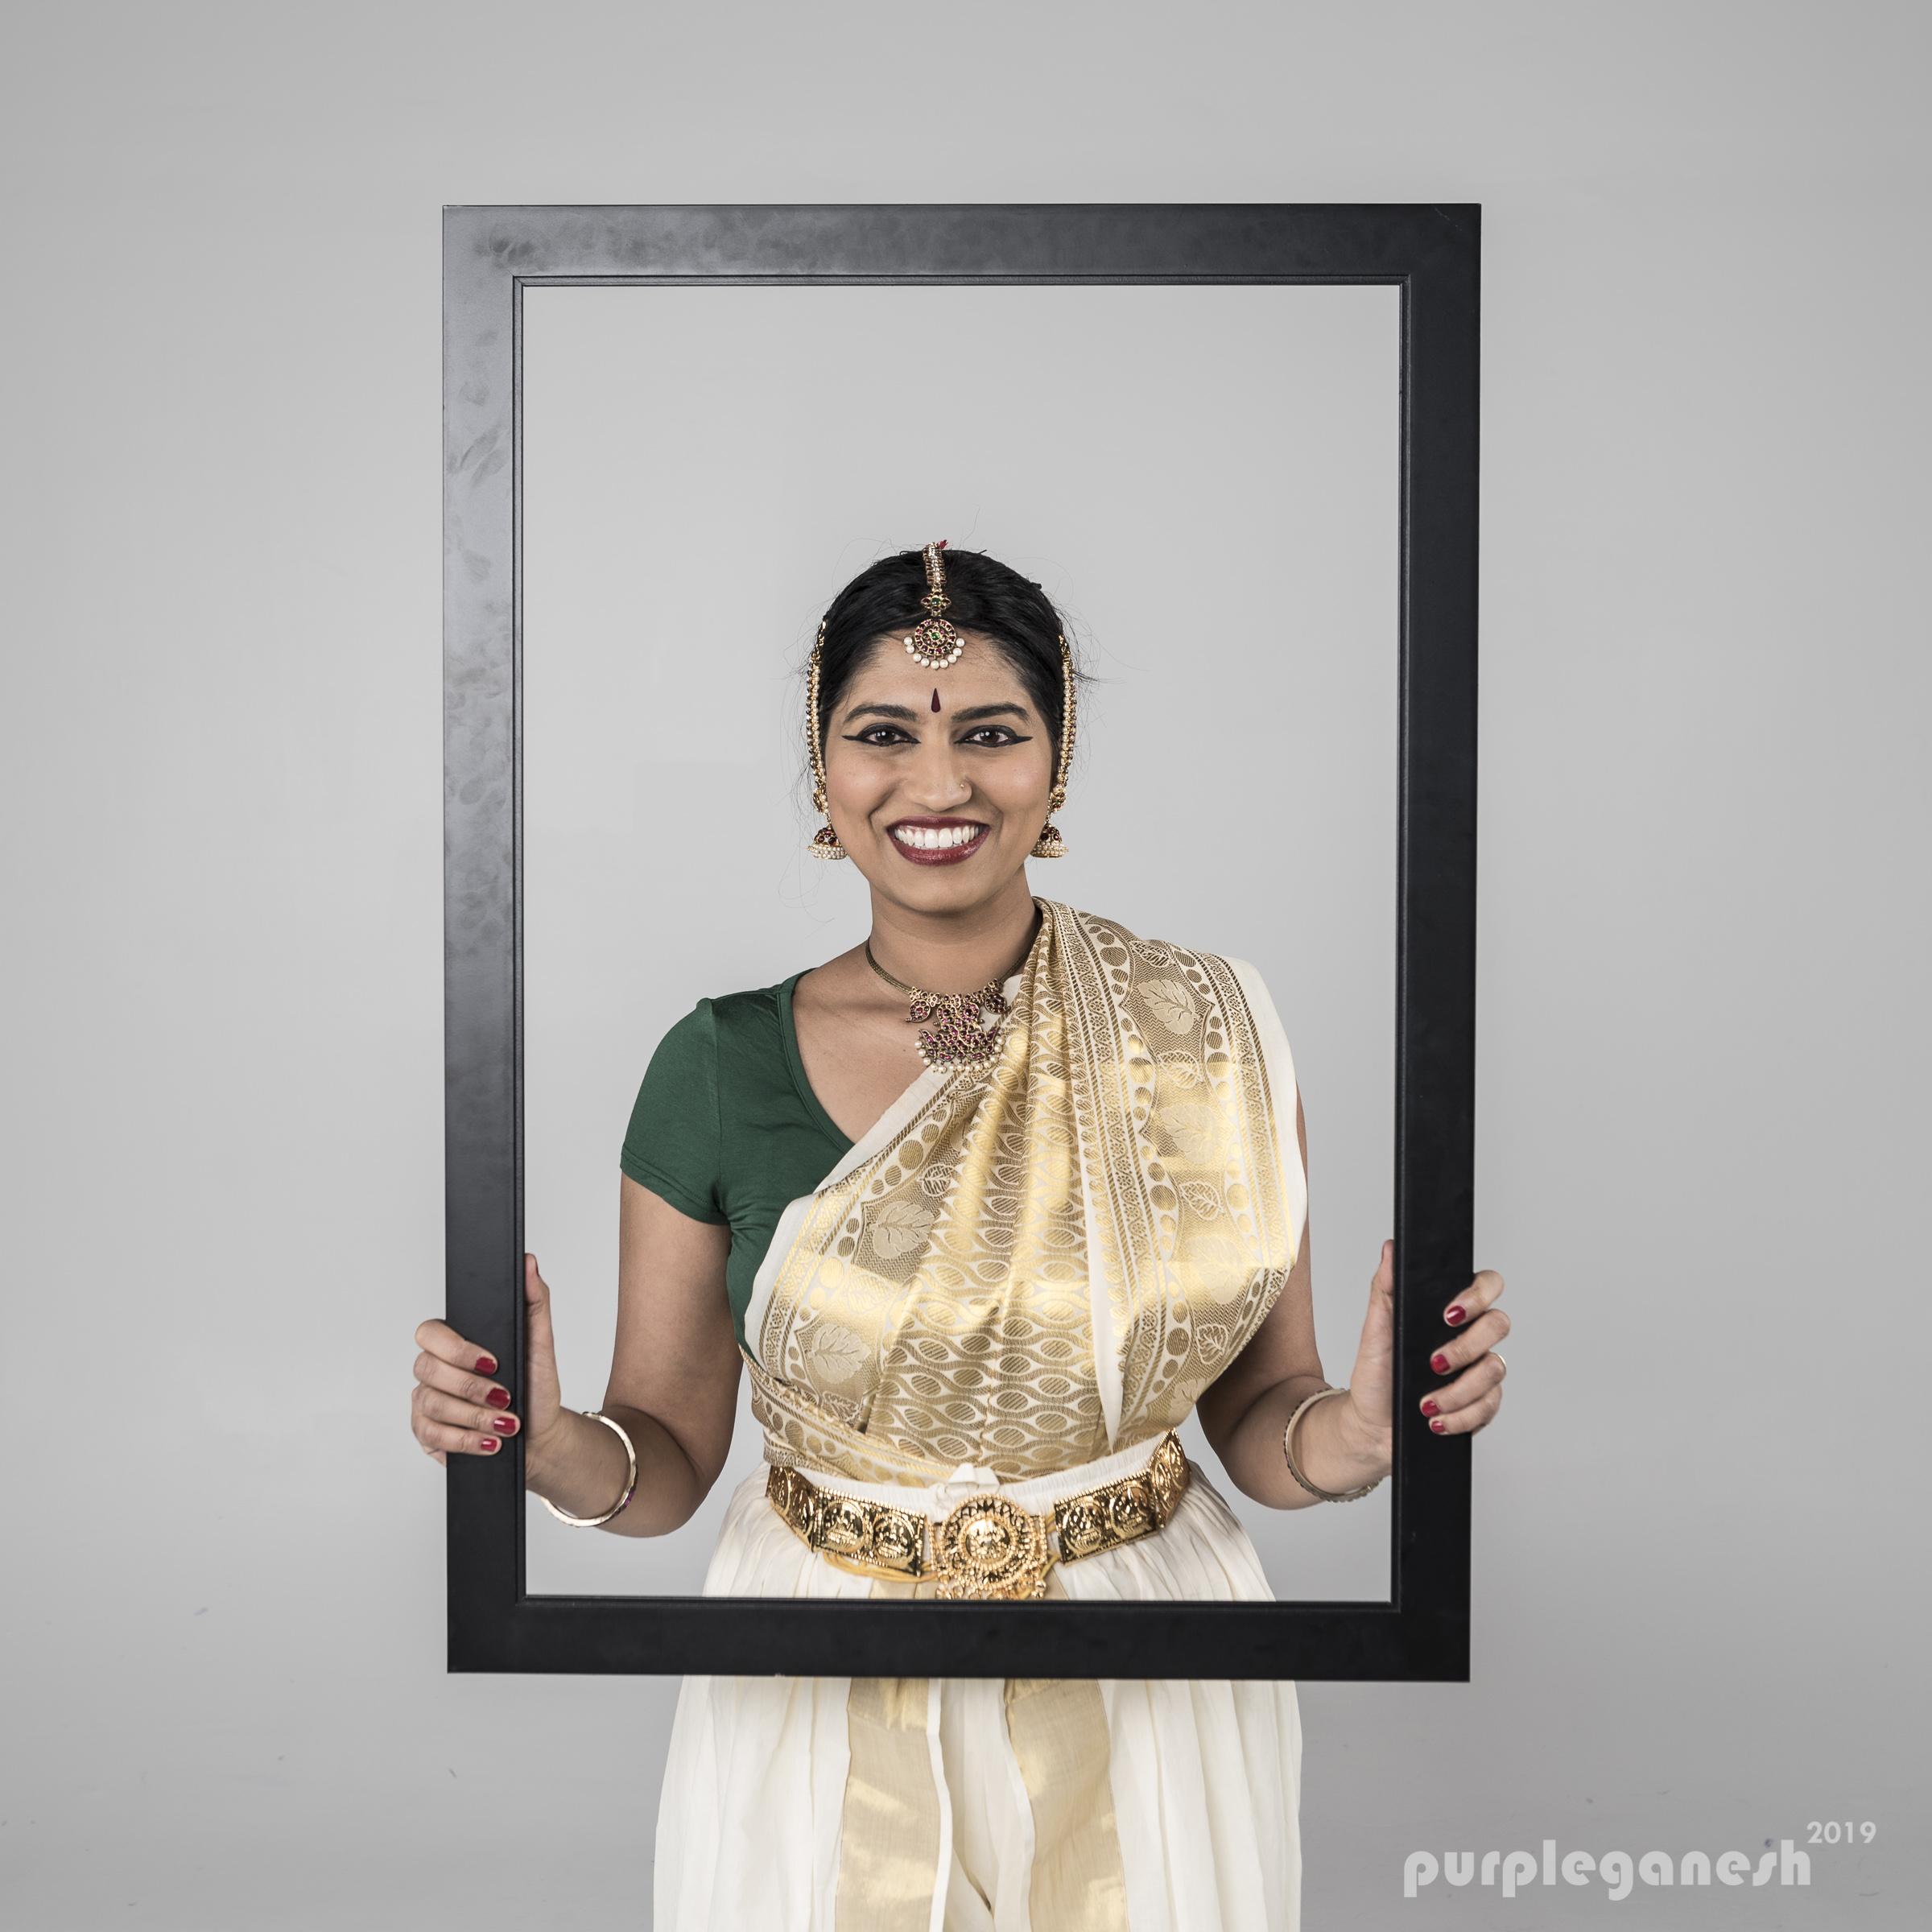 "Dr. Gowri Vijayakumar - started learning Bharatanatyam as a child in Andover from Purnima Gururaja. She pursued further training under Guru Narmada (Bangalore, India); the Dhananjayans, and Katherine Kunhiraman. As an adult, she continued training with Gururaja in Bangalore, India. She has performed in the productions ""Belaku Kanda Balakaru"" and ""Shivotsavam,"" with the Dhananjayans in ""Satyam Sivam Sundaram,"" and in community performances with Katherine Kunhiraman's Kalanjali Dance School."